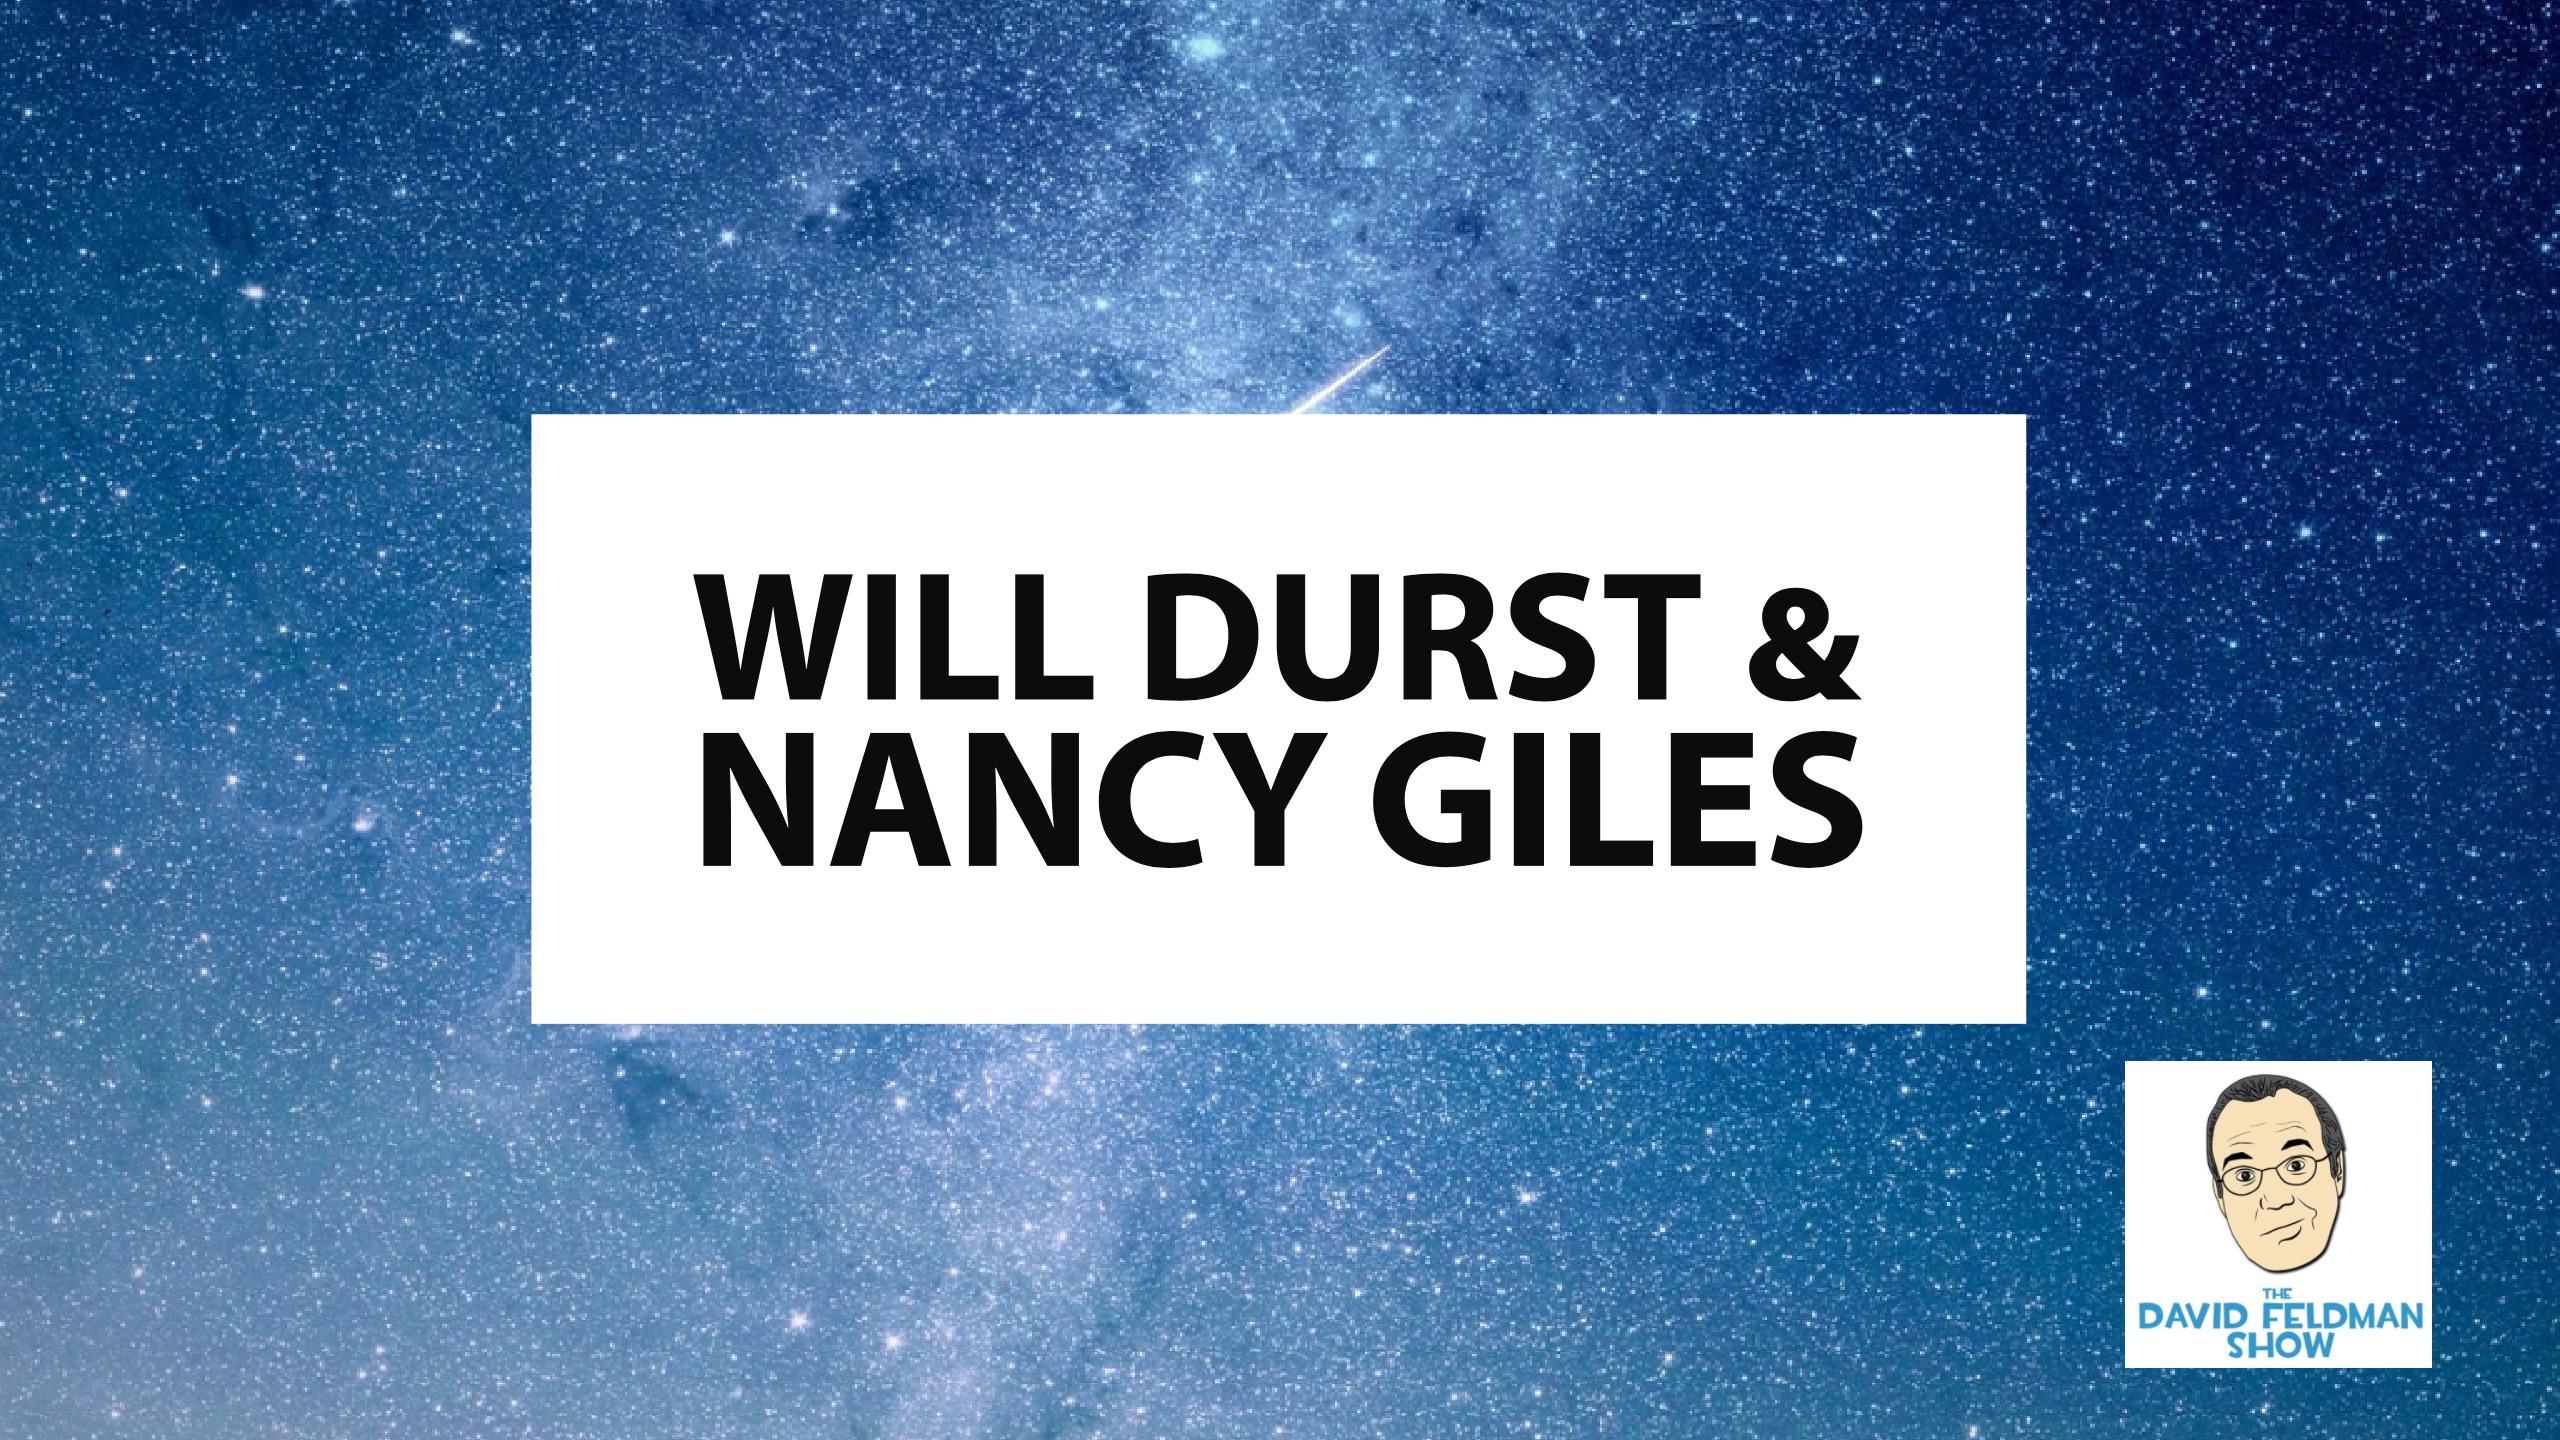 Will Durst & Nancy Giles